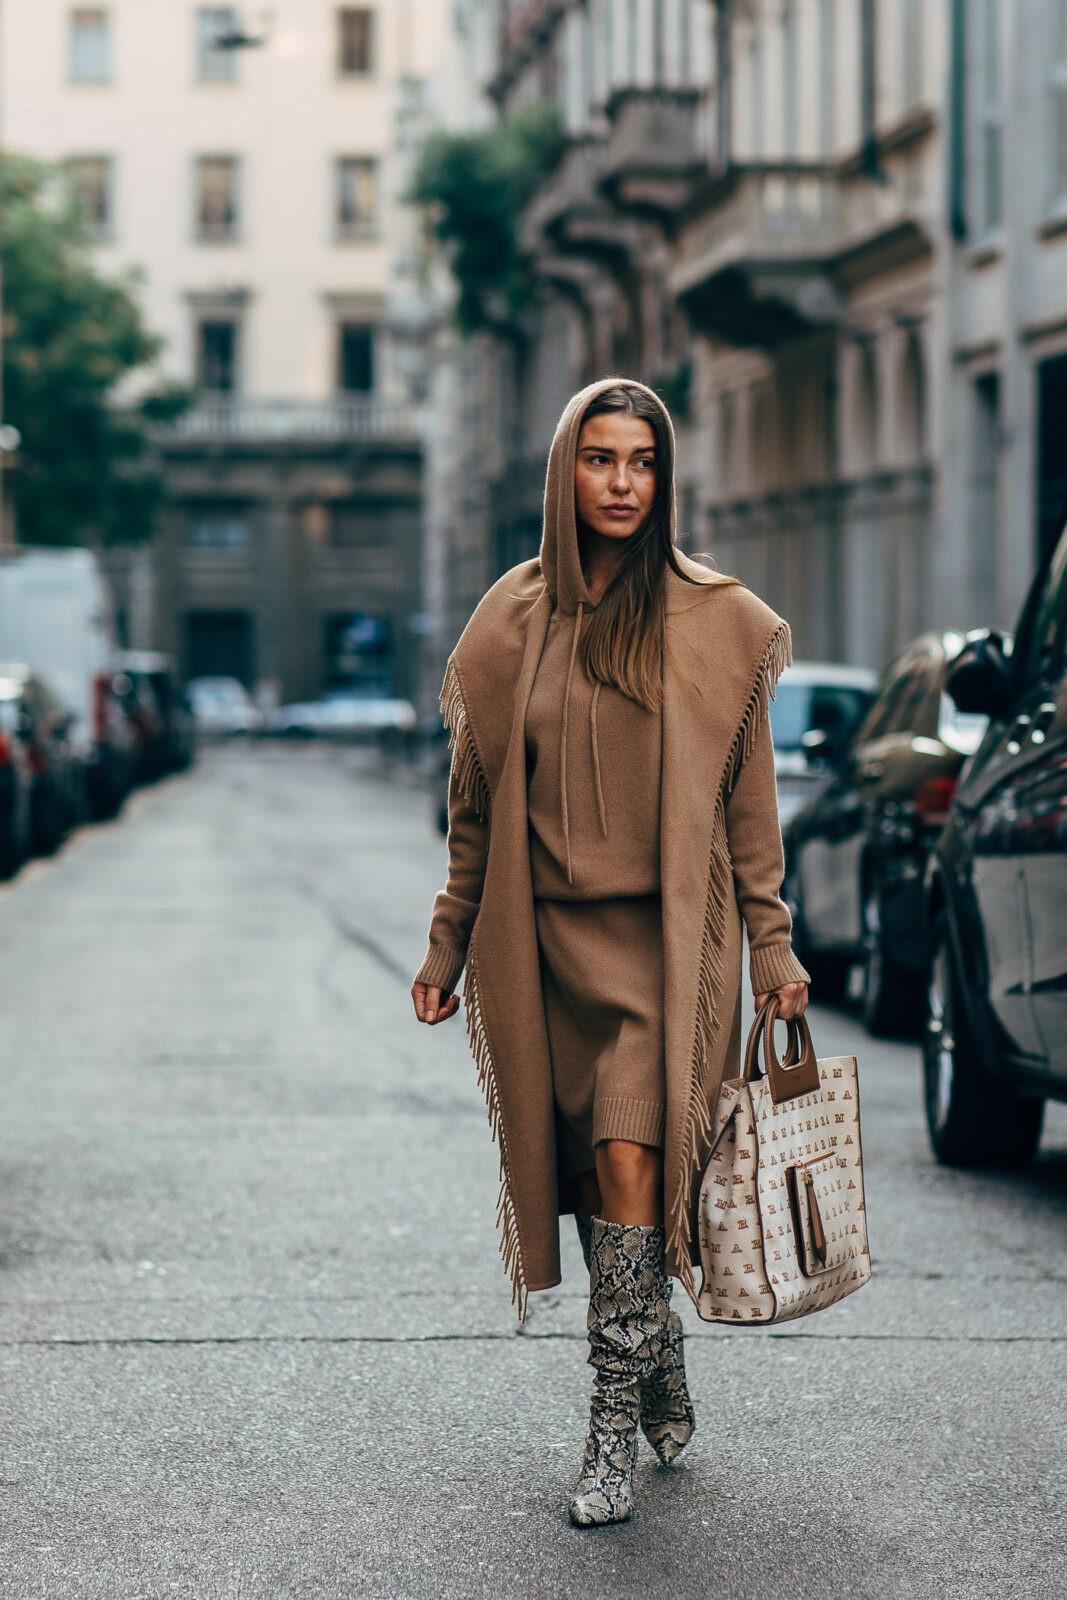 sophia roe edit seven camel coat stylebook january 2019